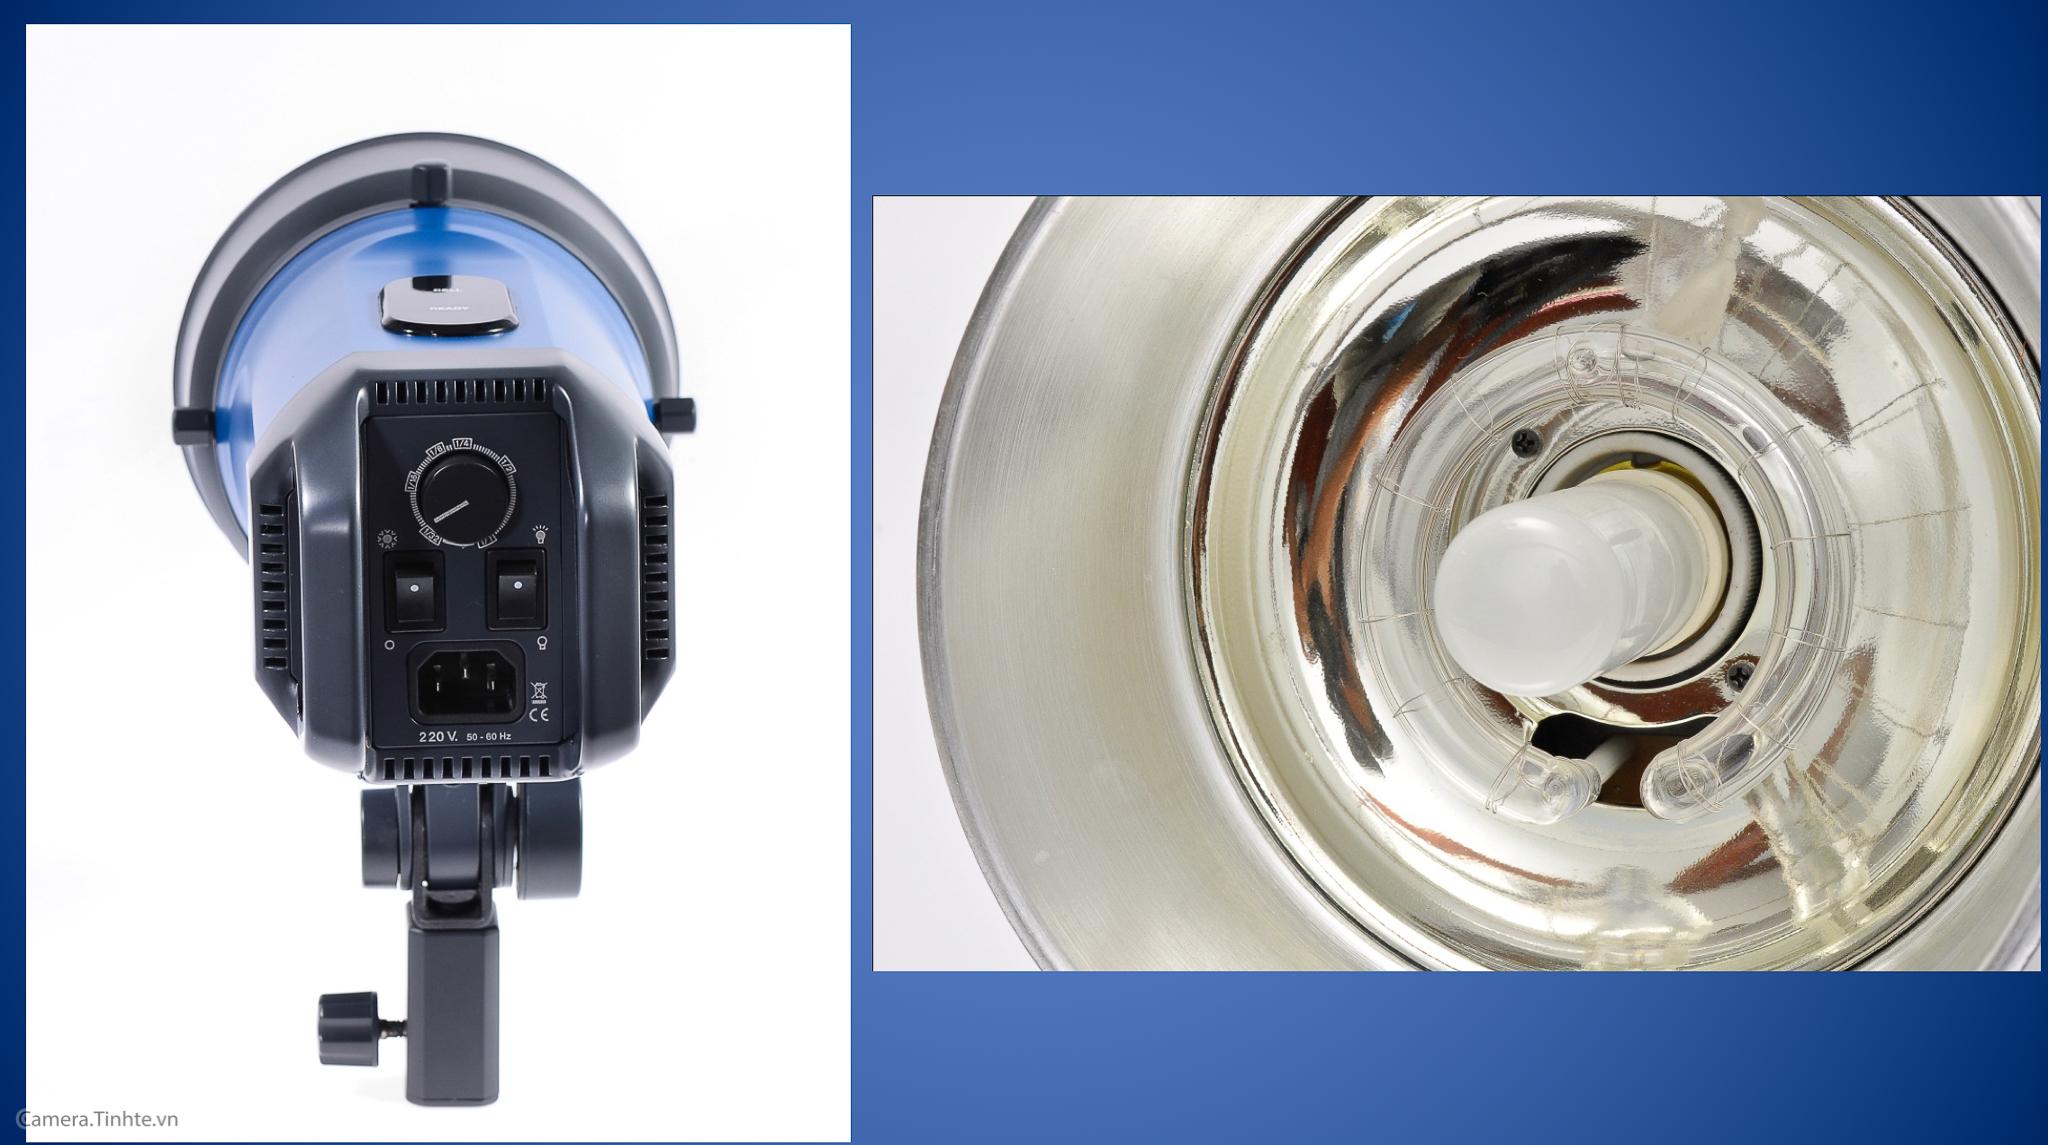 slide NACB 5 - Flash - Camera.tinhte.vn-10.jpg